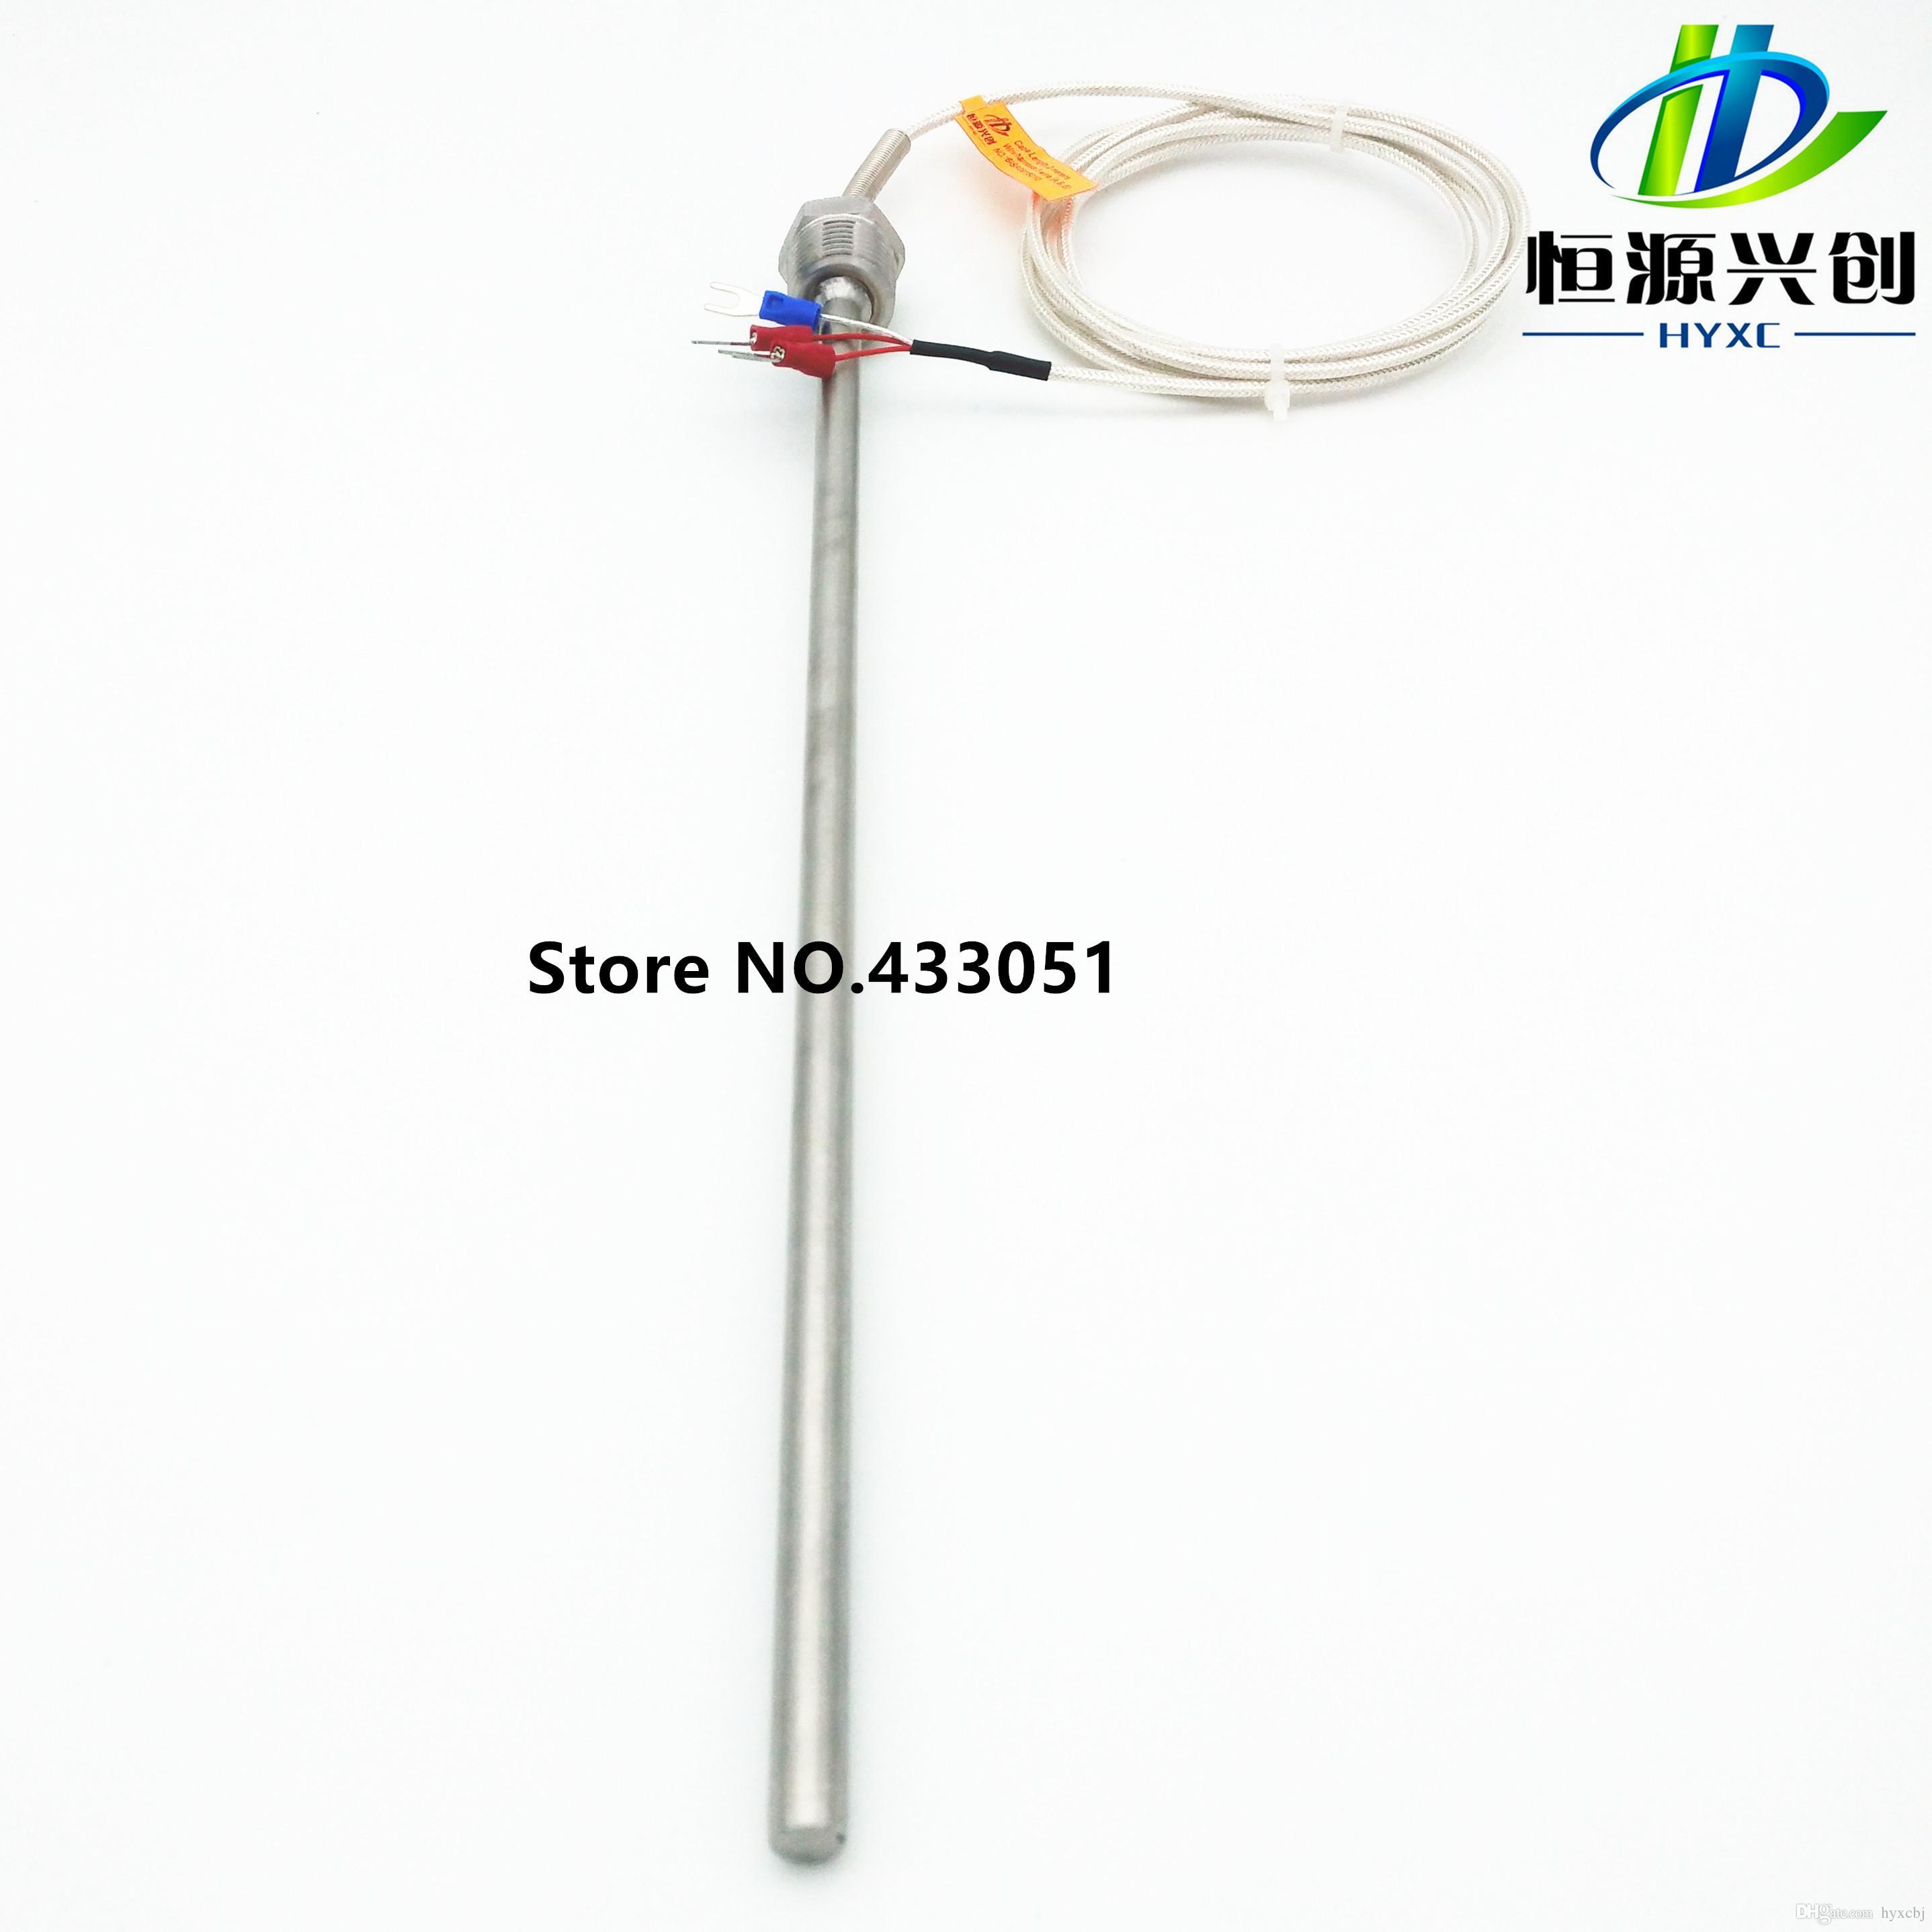 Pt100 Ohm Probe Sensor L 300mm Long Type Pt Npt 1 2 Thread With Lead Wire Rtd Pt100 Pt Npt